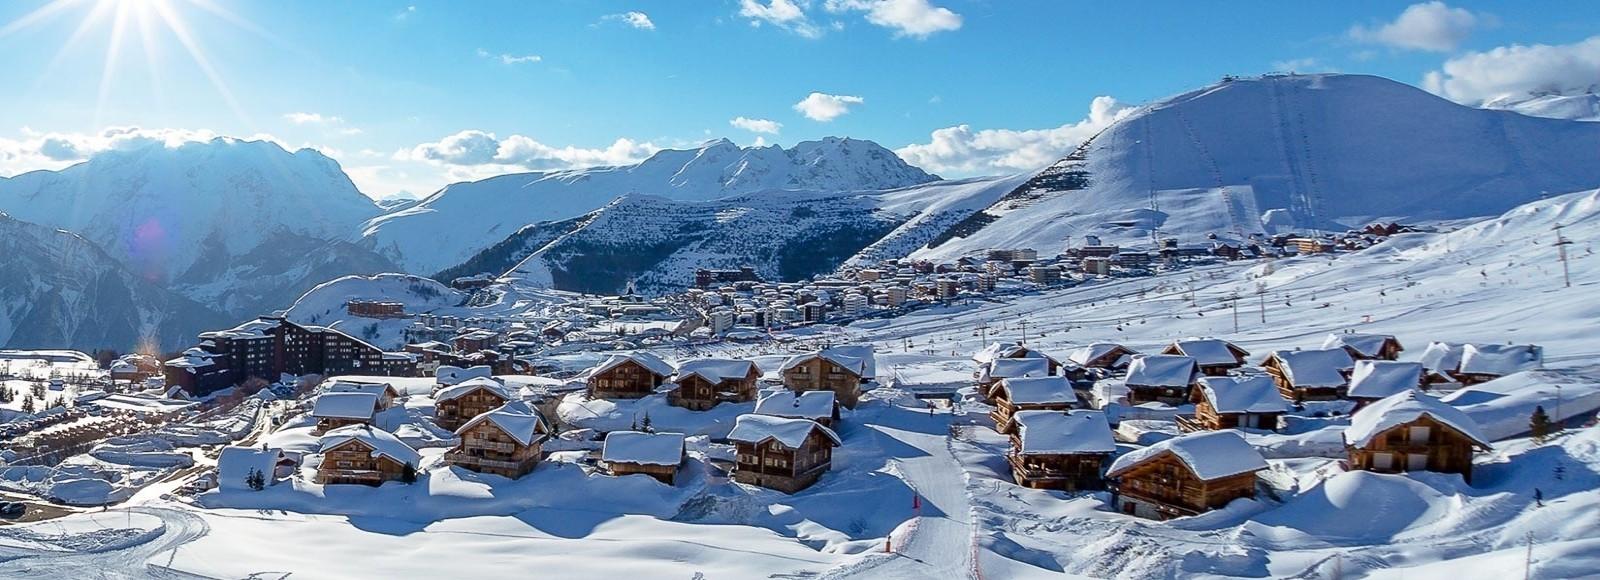 Альп-д'Юэз (Alpe D'Huez), Франция